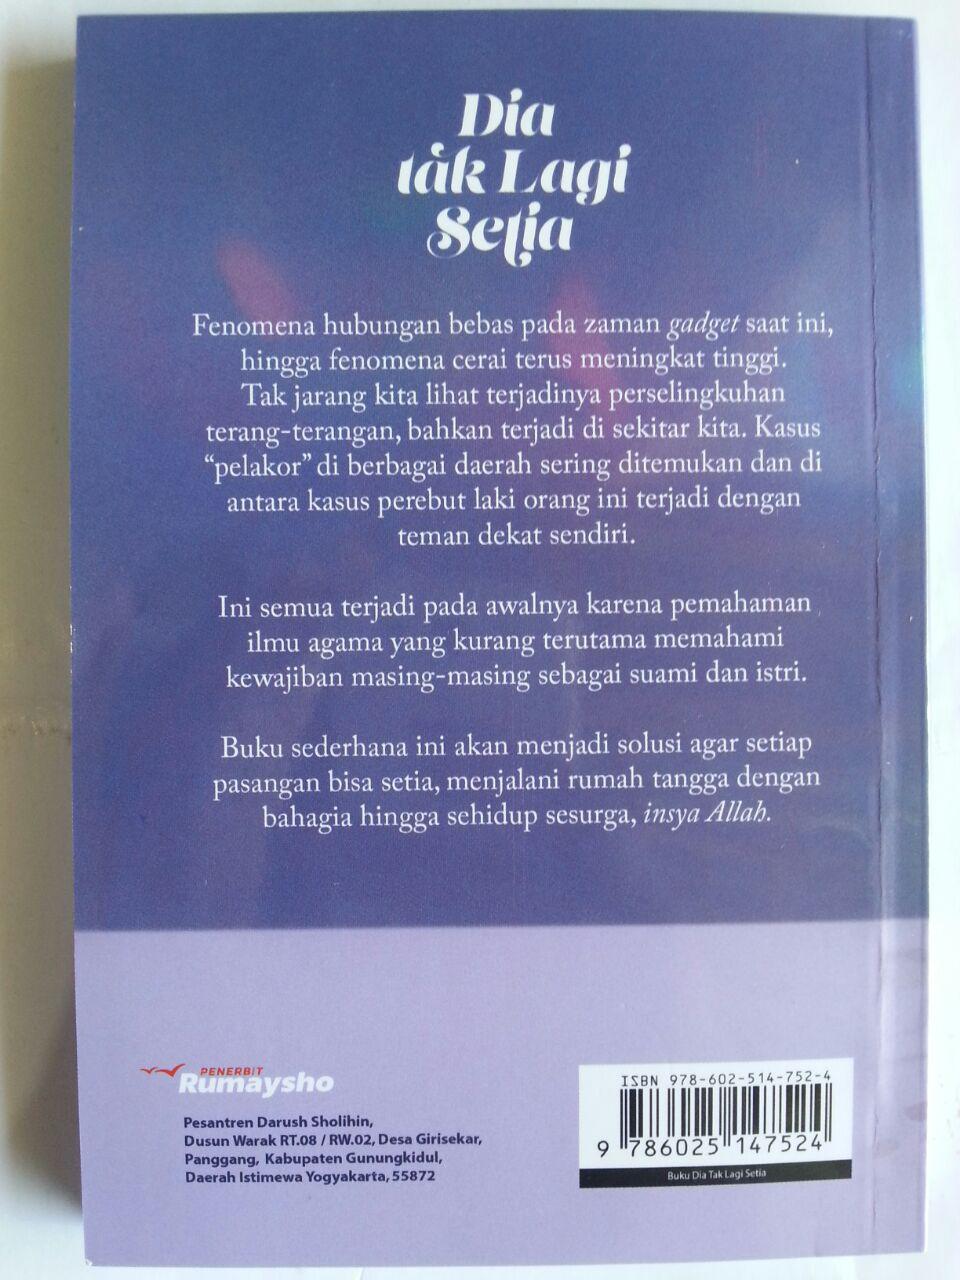 Buku Dia Tak Lagi Setia cover